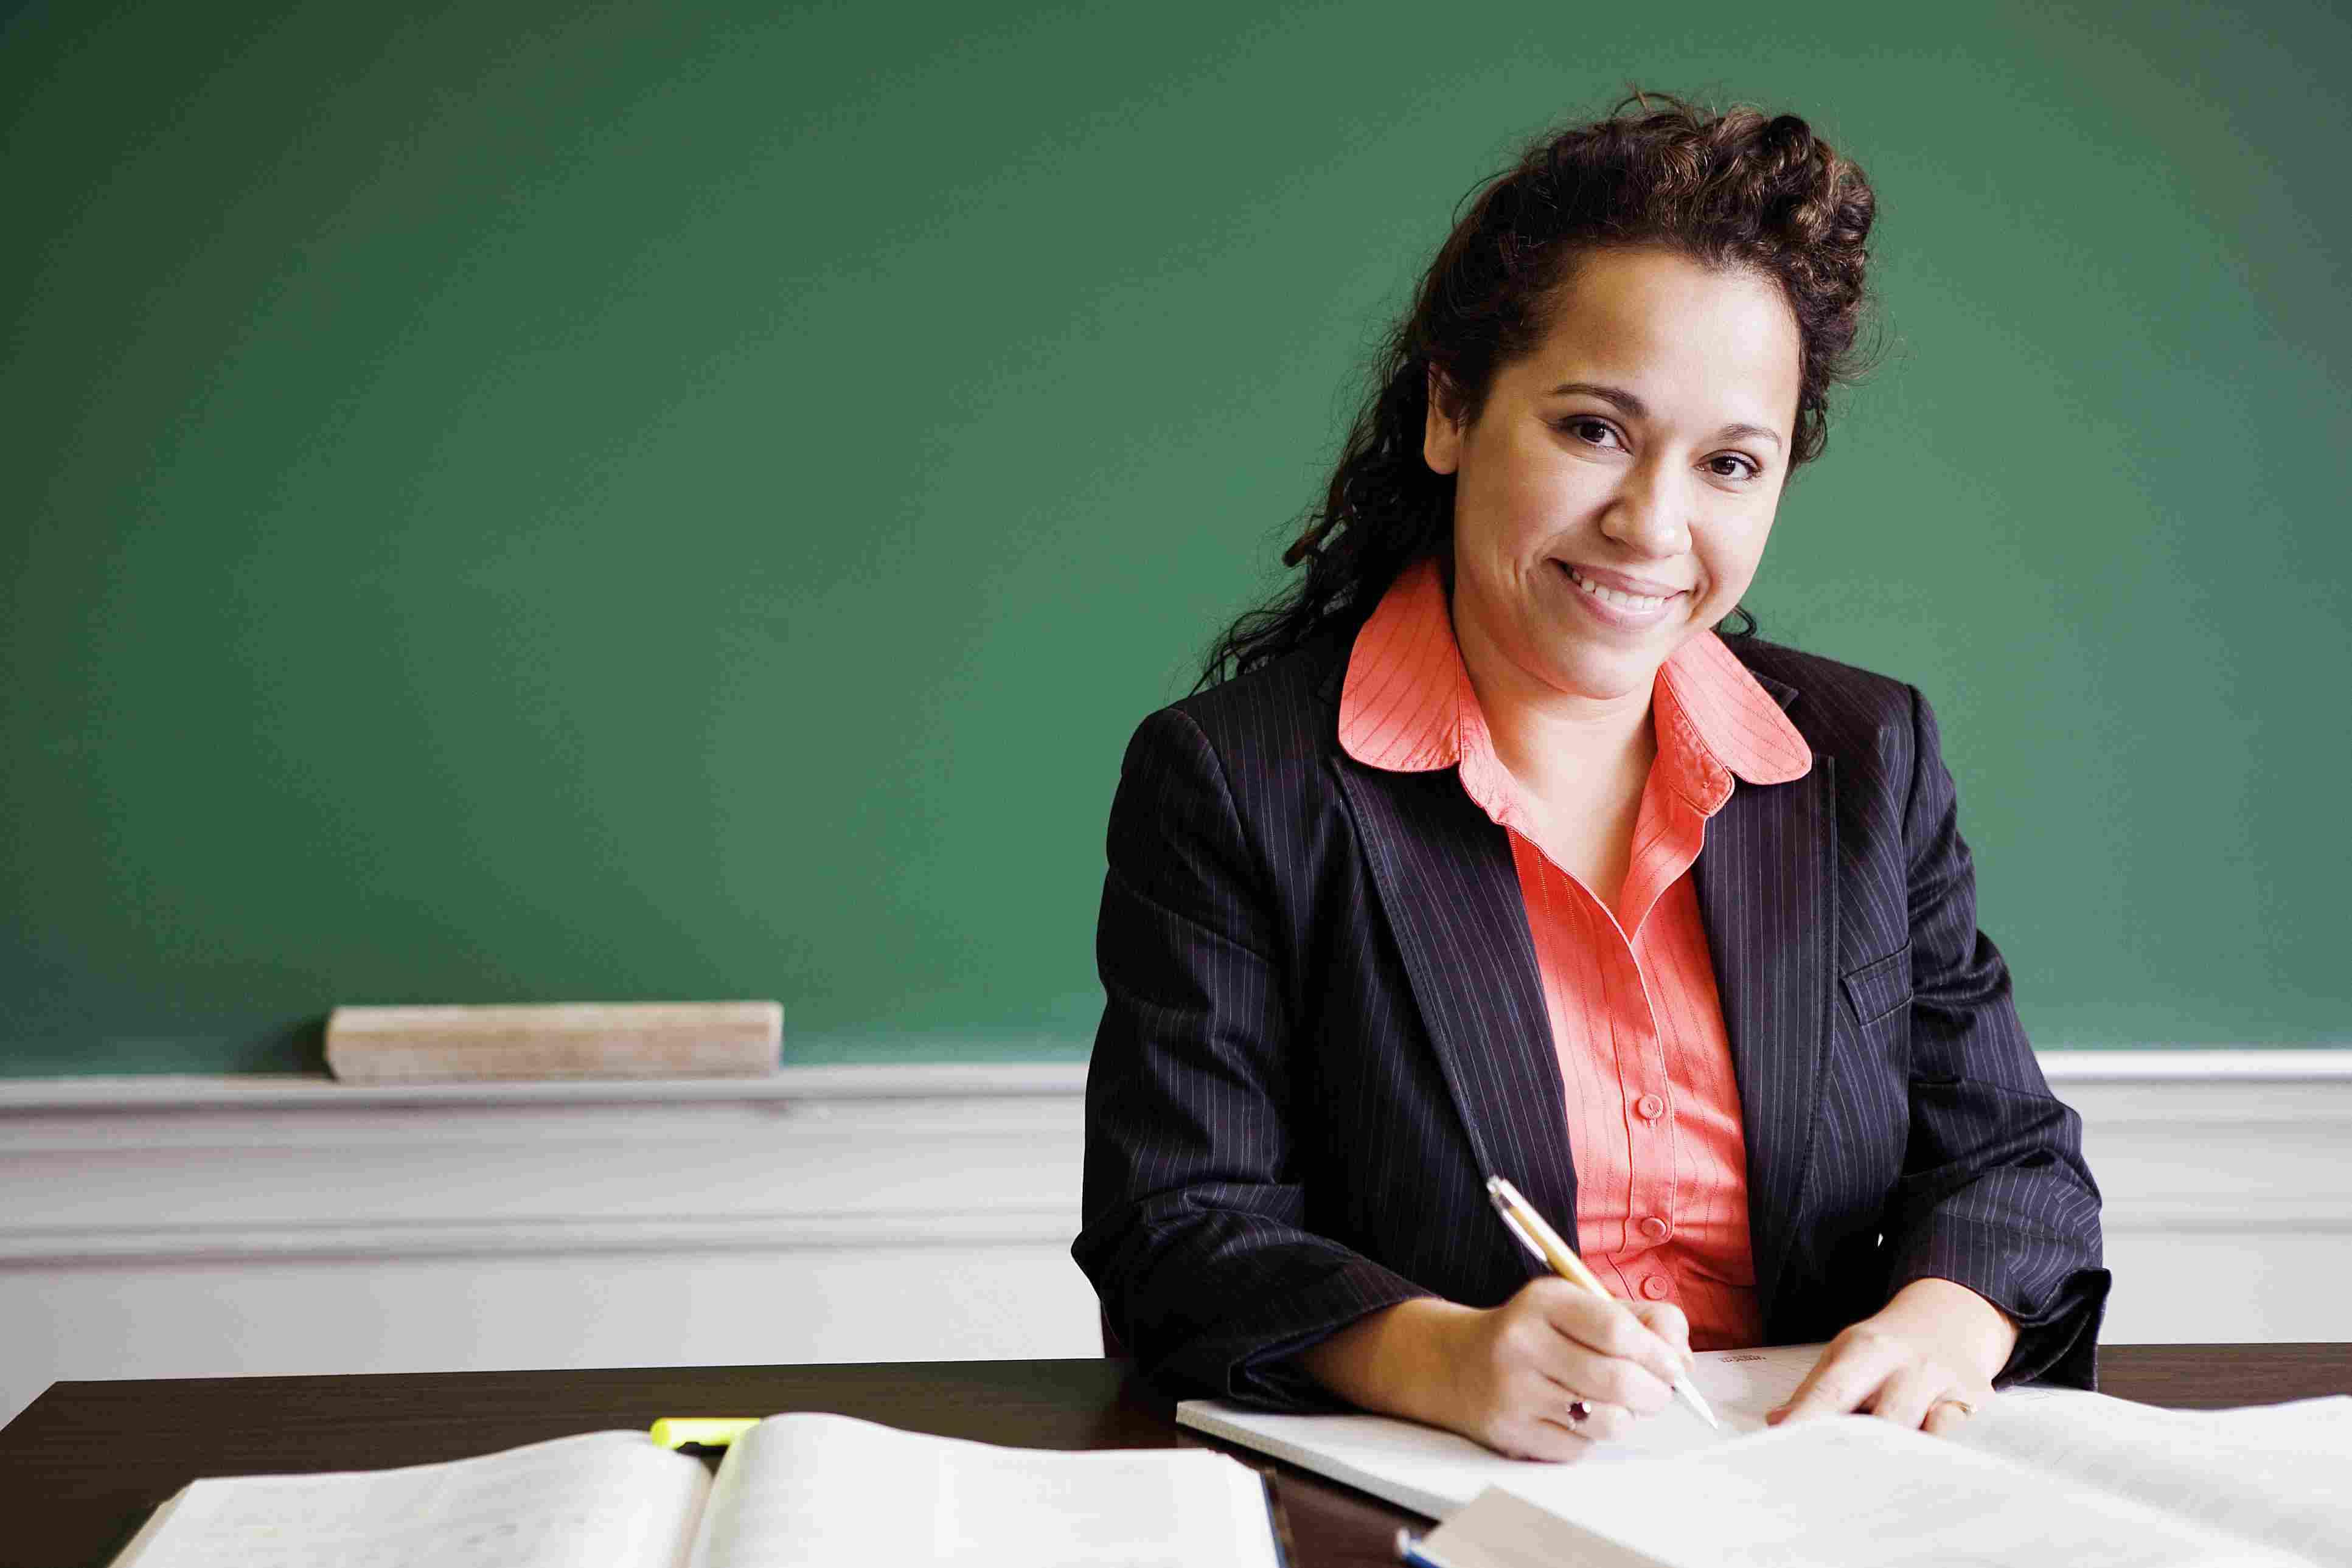 Maestra latina.